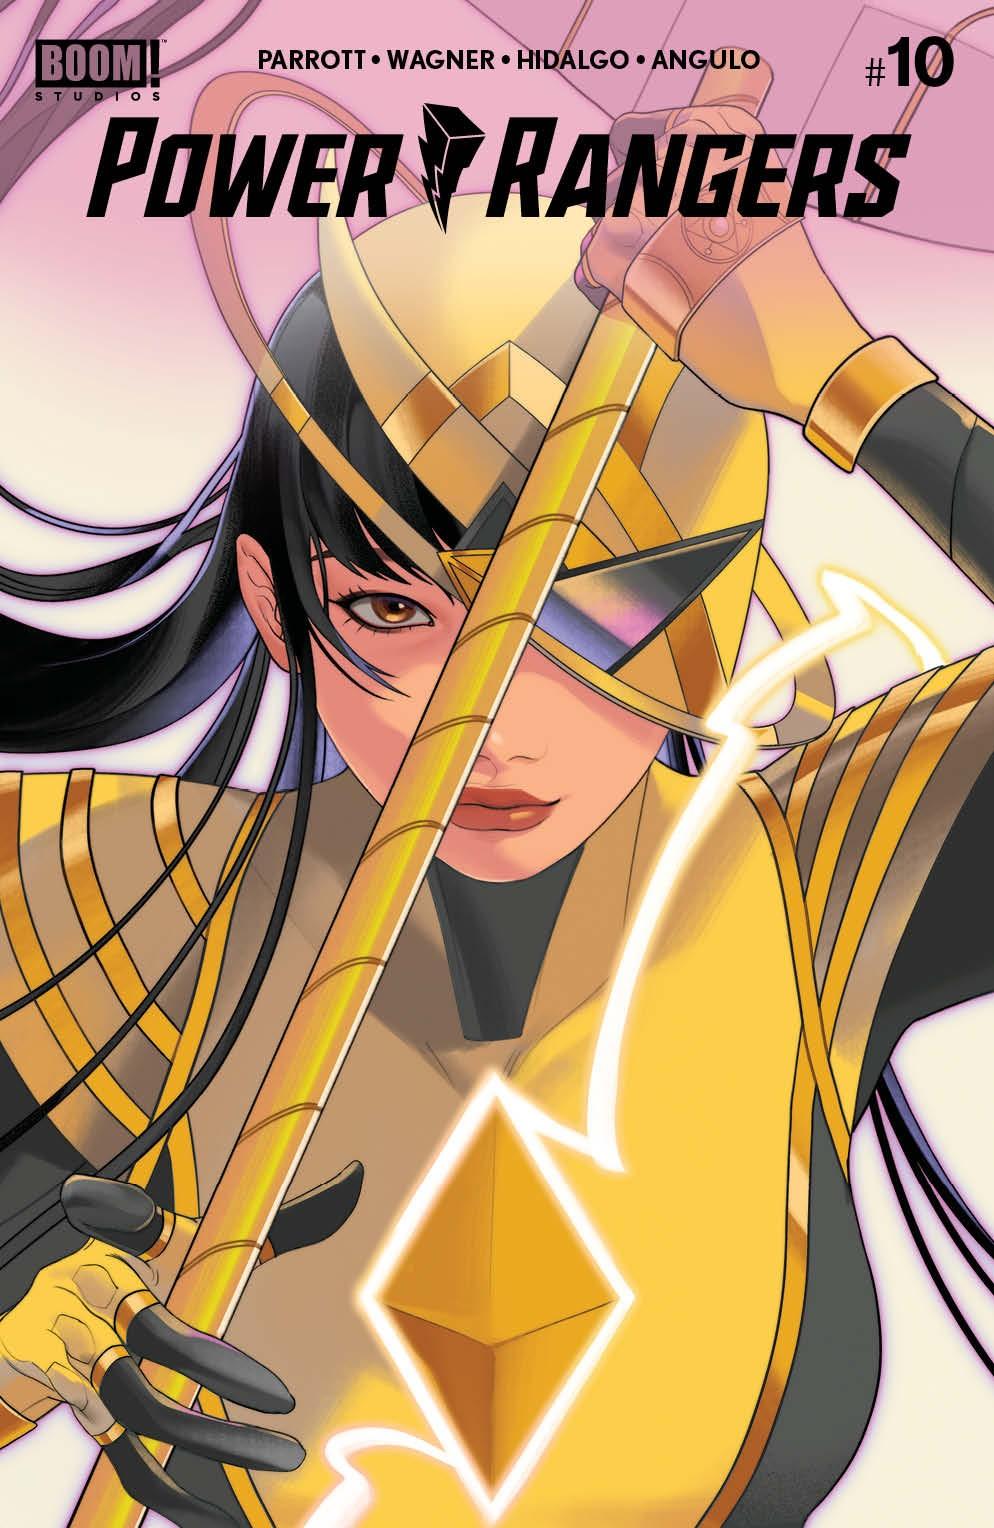 PowerRangers_010_Cover_F_Variant ComicList Previews: POWER RANGERS #10